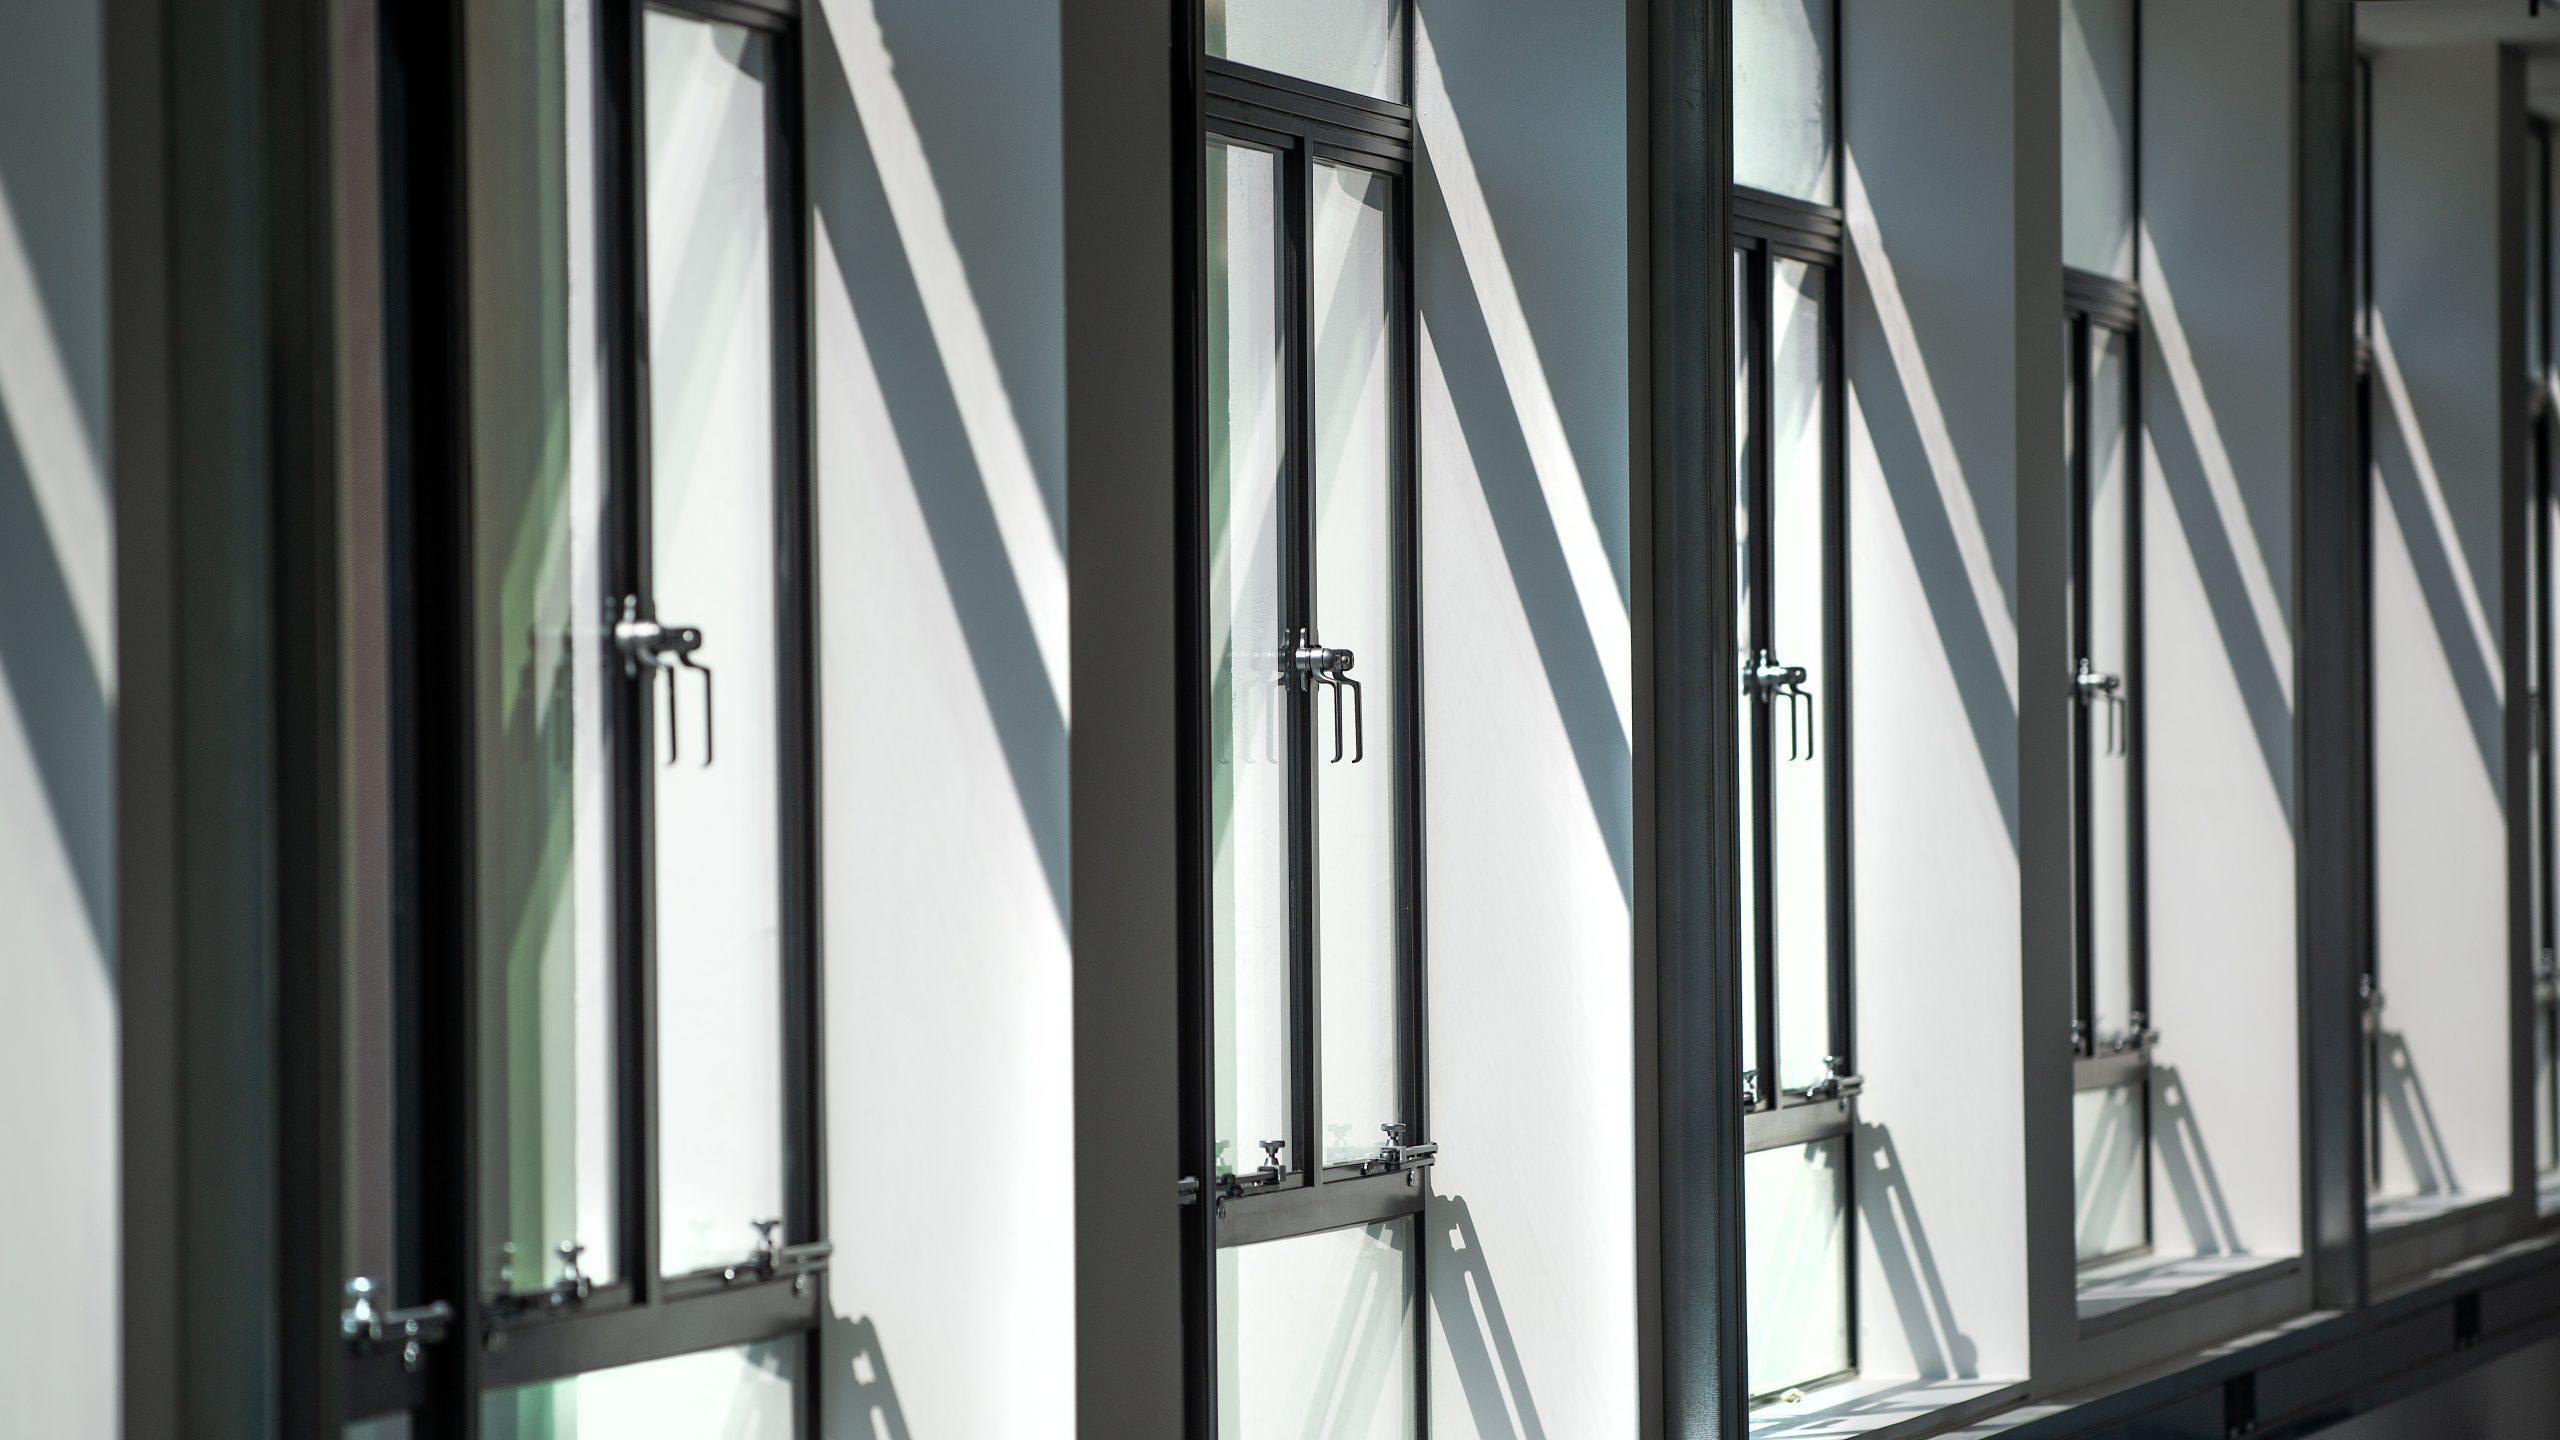 View of multiple multi-point locking metal windows